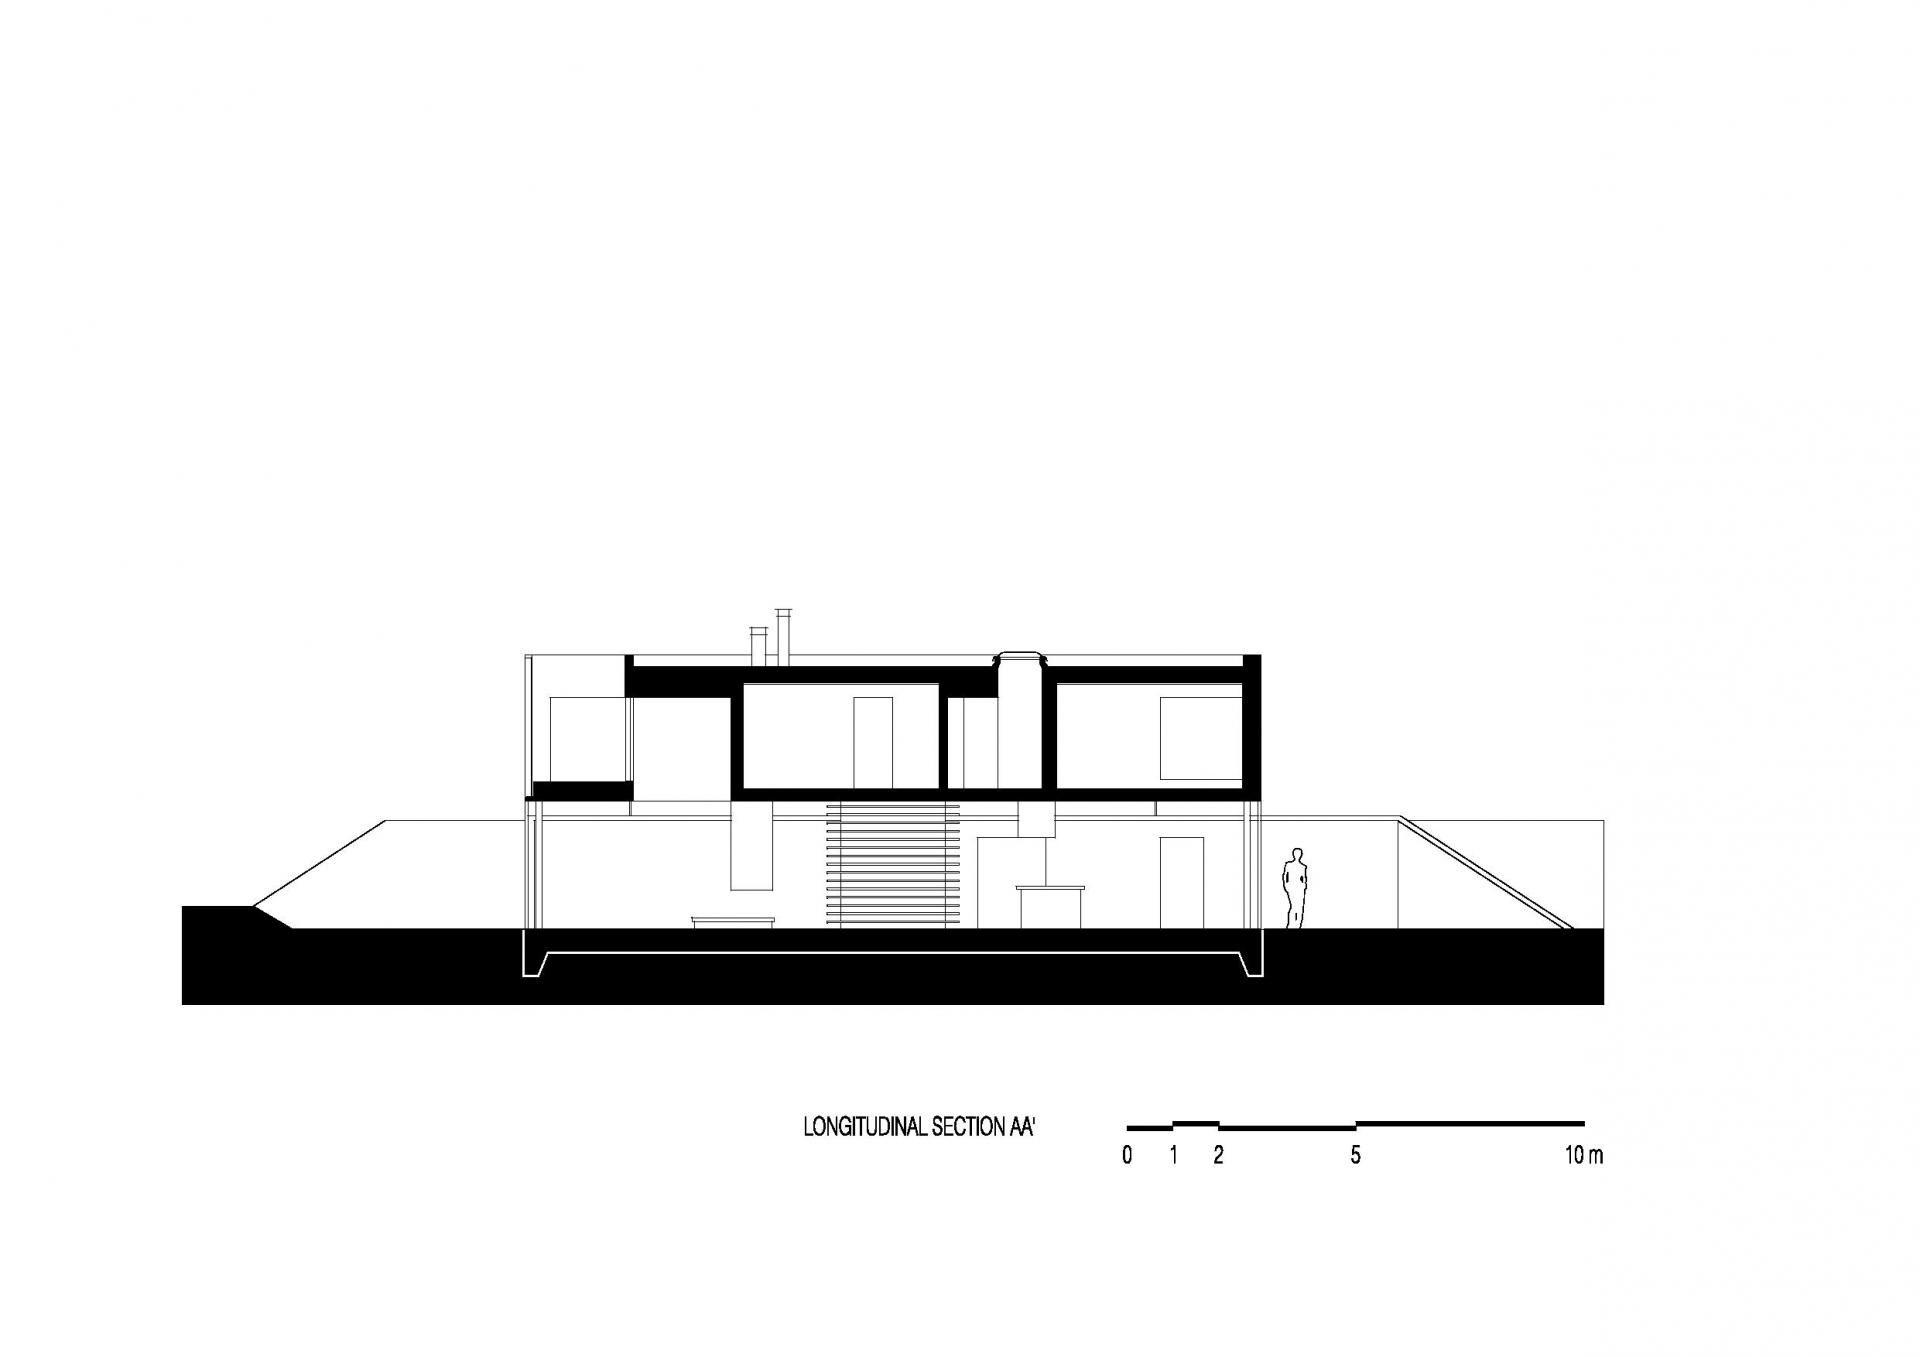 Rem koolhaas villa dall ava paris france 1991 atlas of - Gallery Of Ad Classics Villa Dall Ava Oma 15 Rem Koolhaas Architecture Drawings And Architecture